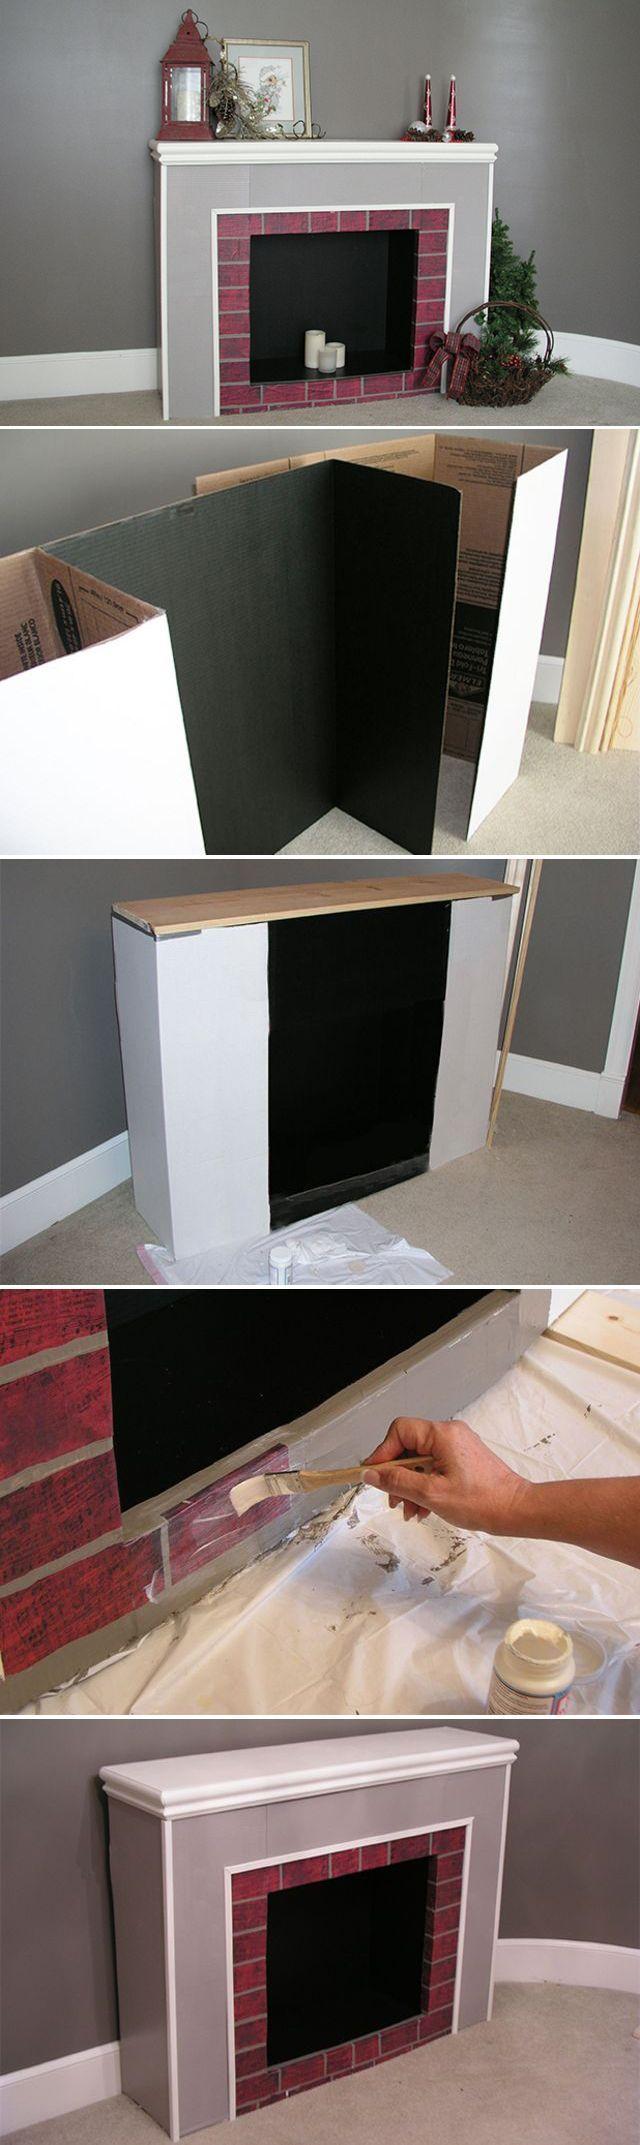 How to Make a Cardboard Christmas Fireplace | Cardboard display ...